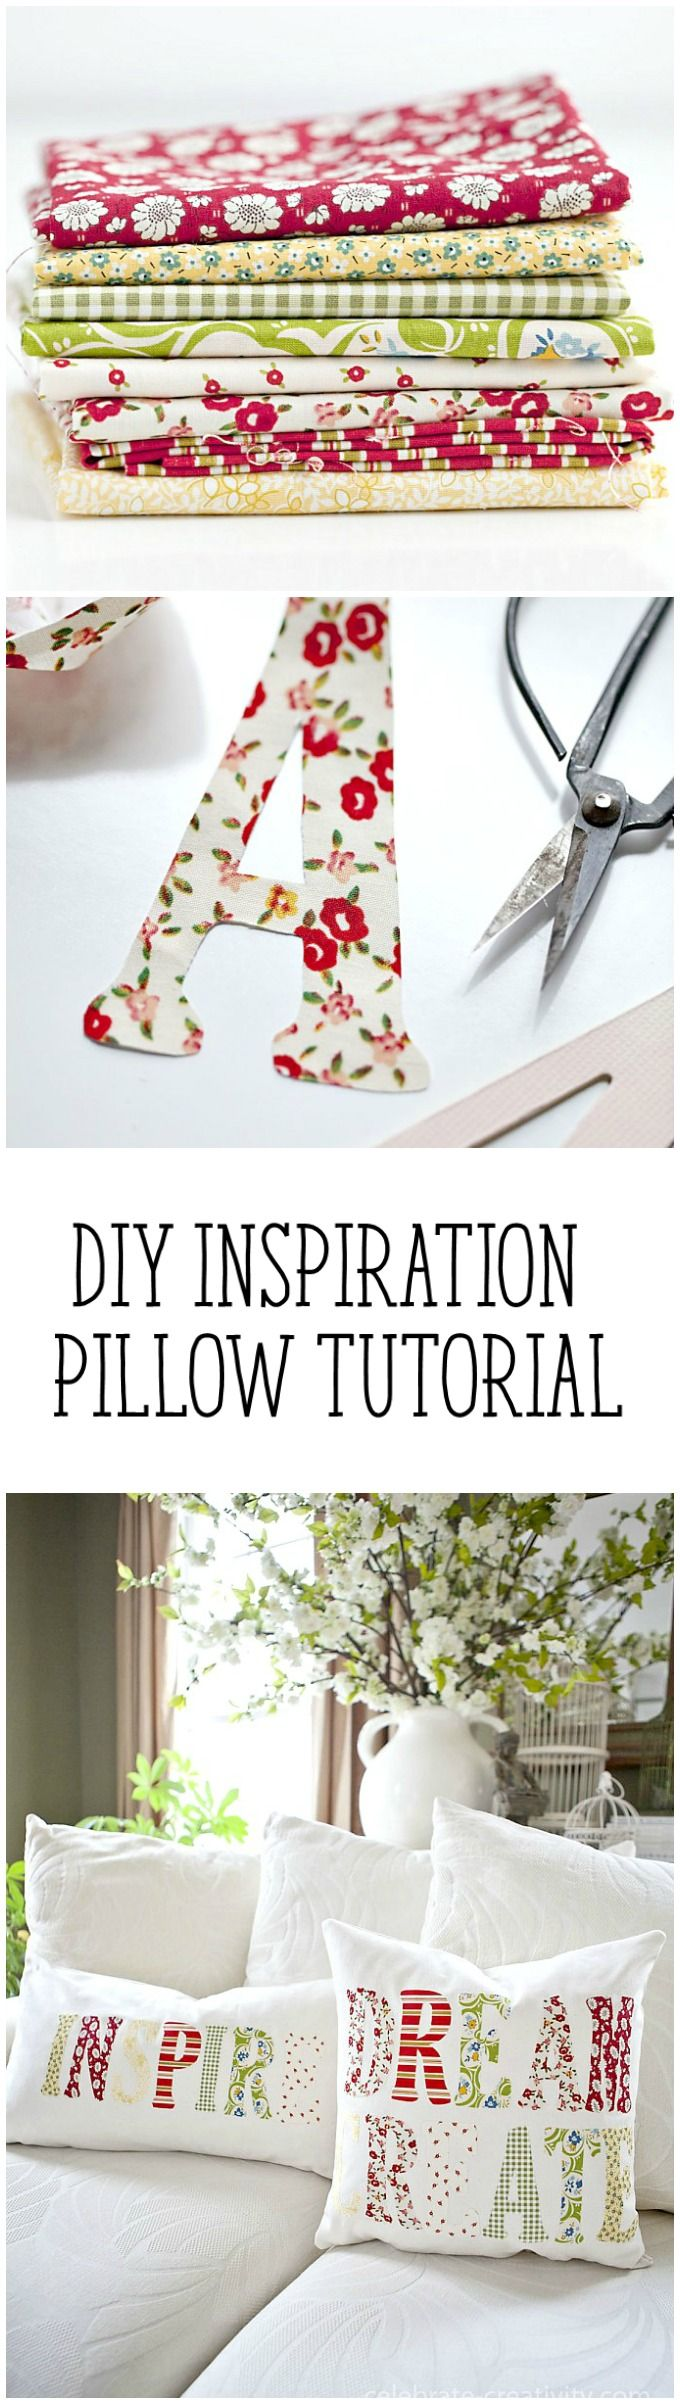 diy inspiration throw pillows pinterest fr hlingsmotiv sofakissen und diy wohnen. Black Bedroom Furniture Sets. Home Design Ideas